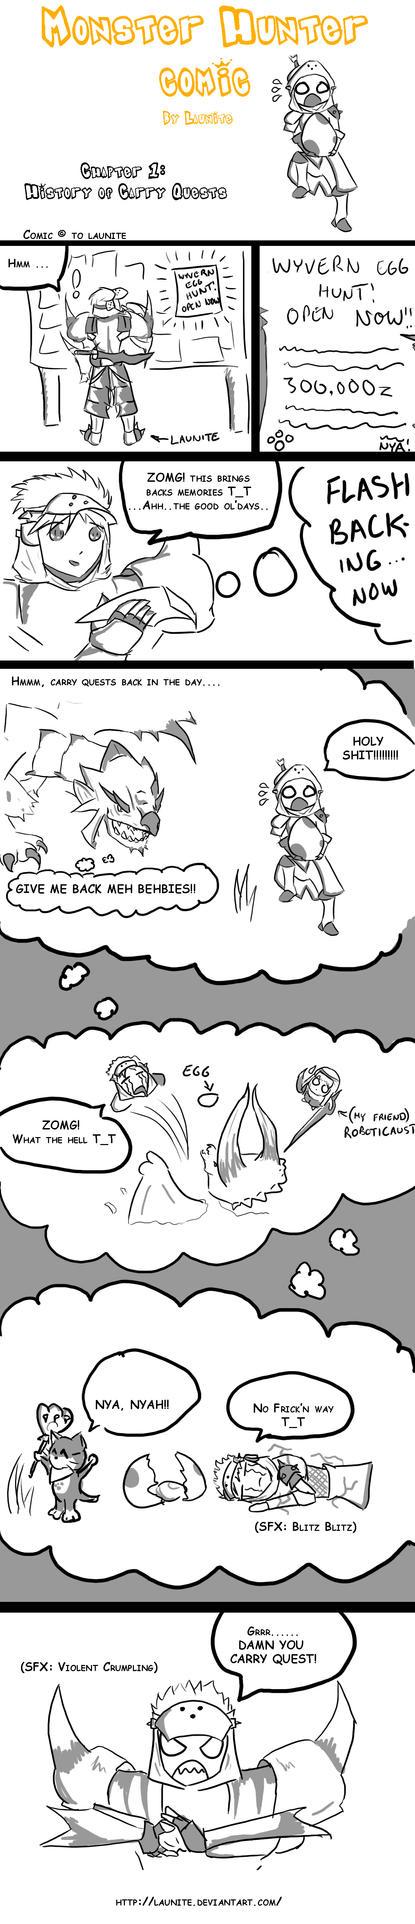 Monster Hunter Comic Chap.1 by Launite